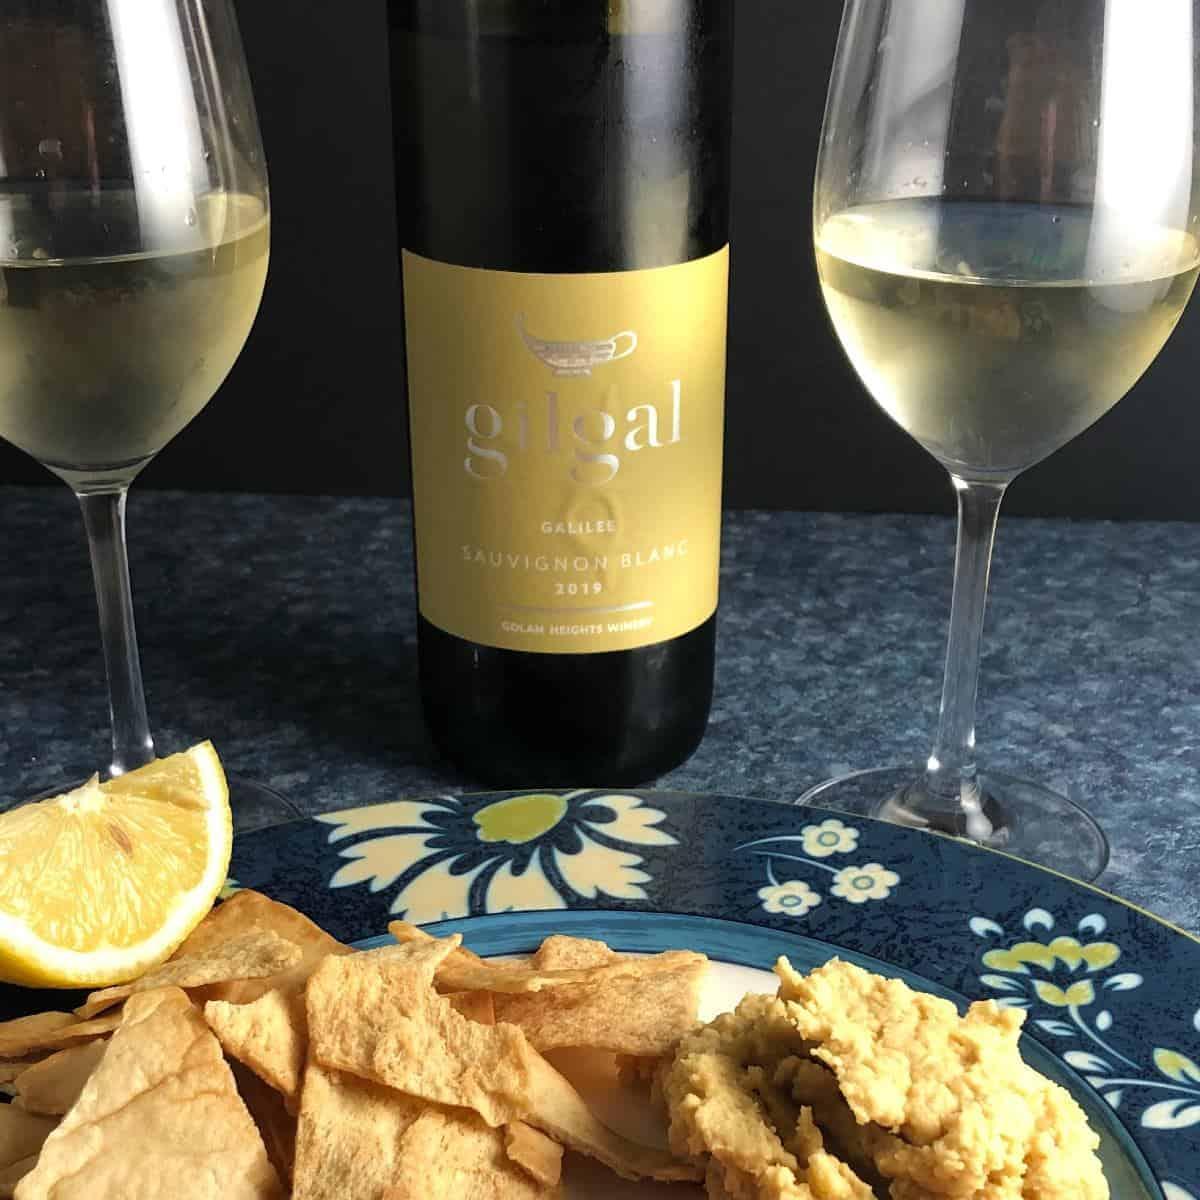 Gilgal Sauvignon Blanc paired with hummus.